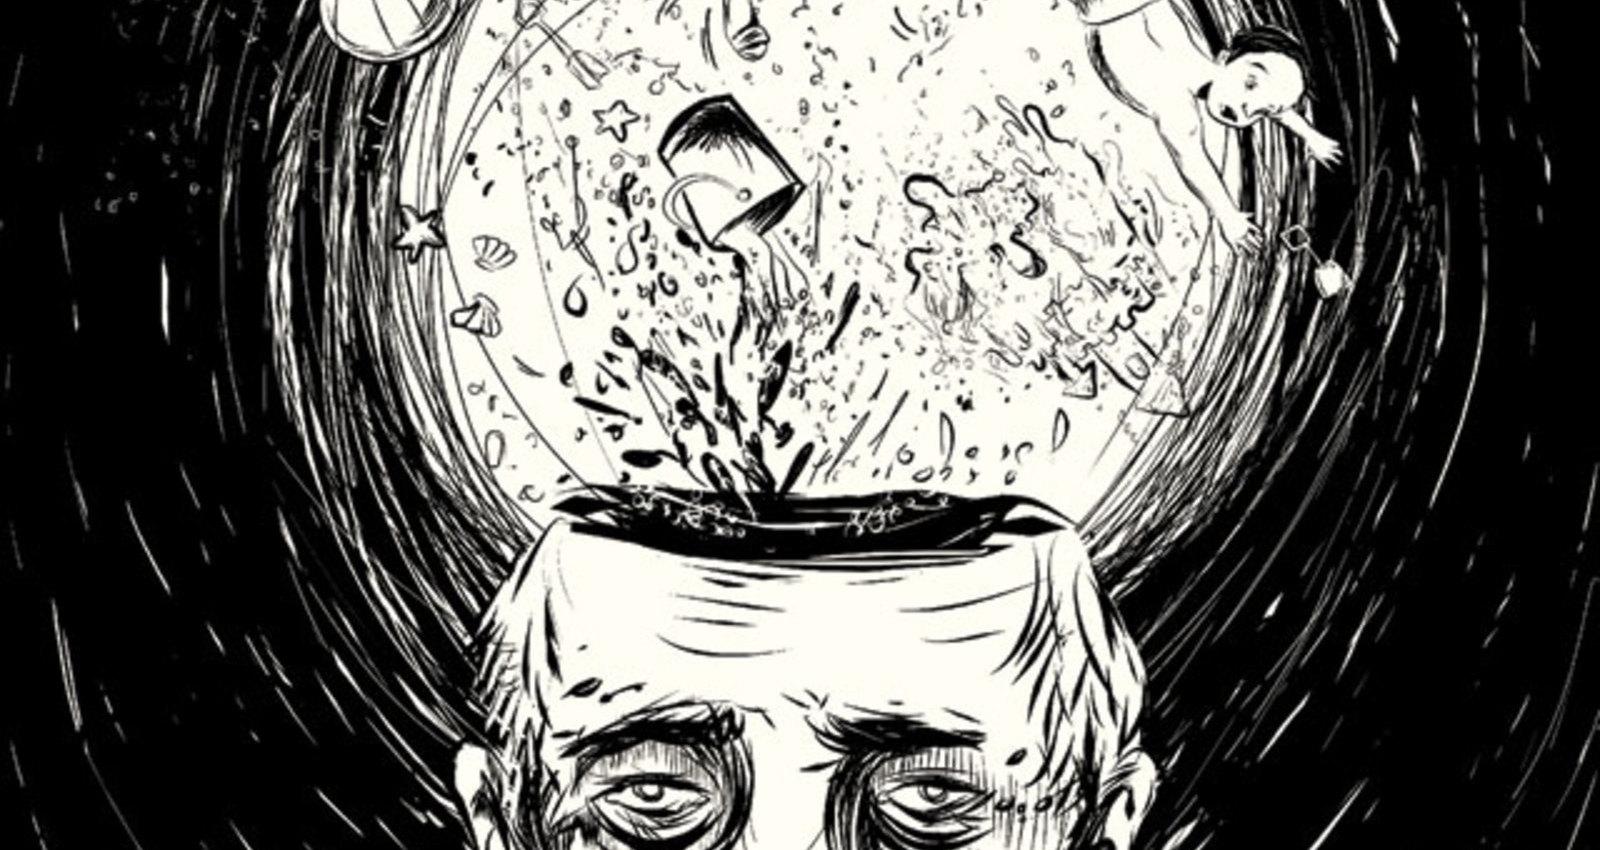 Alzheimersdisease.sg